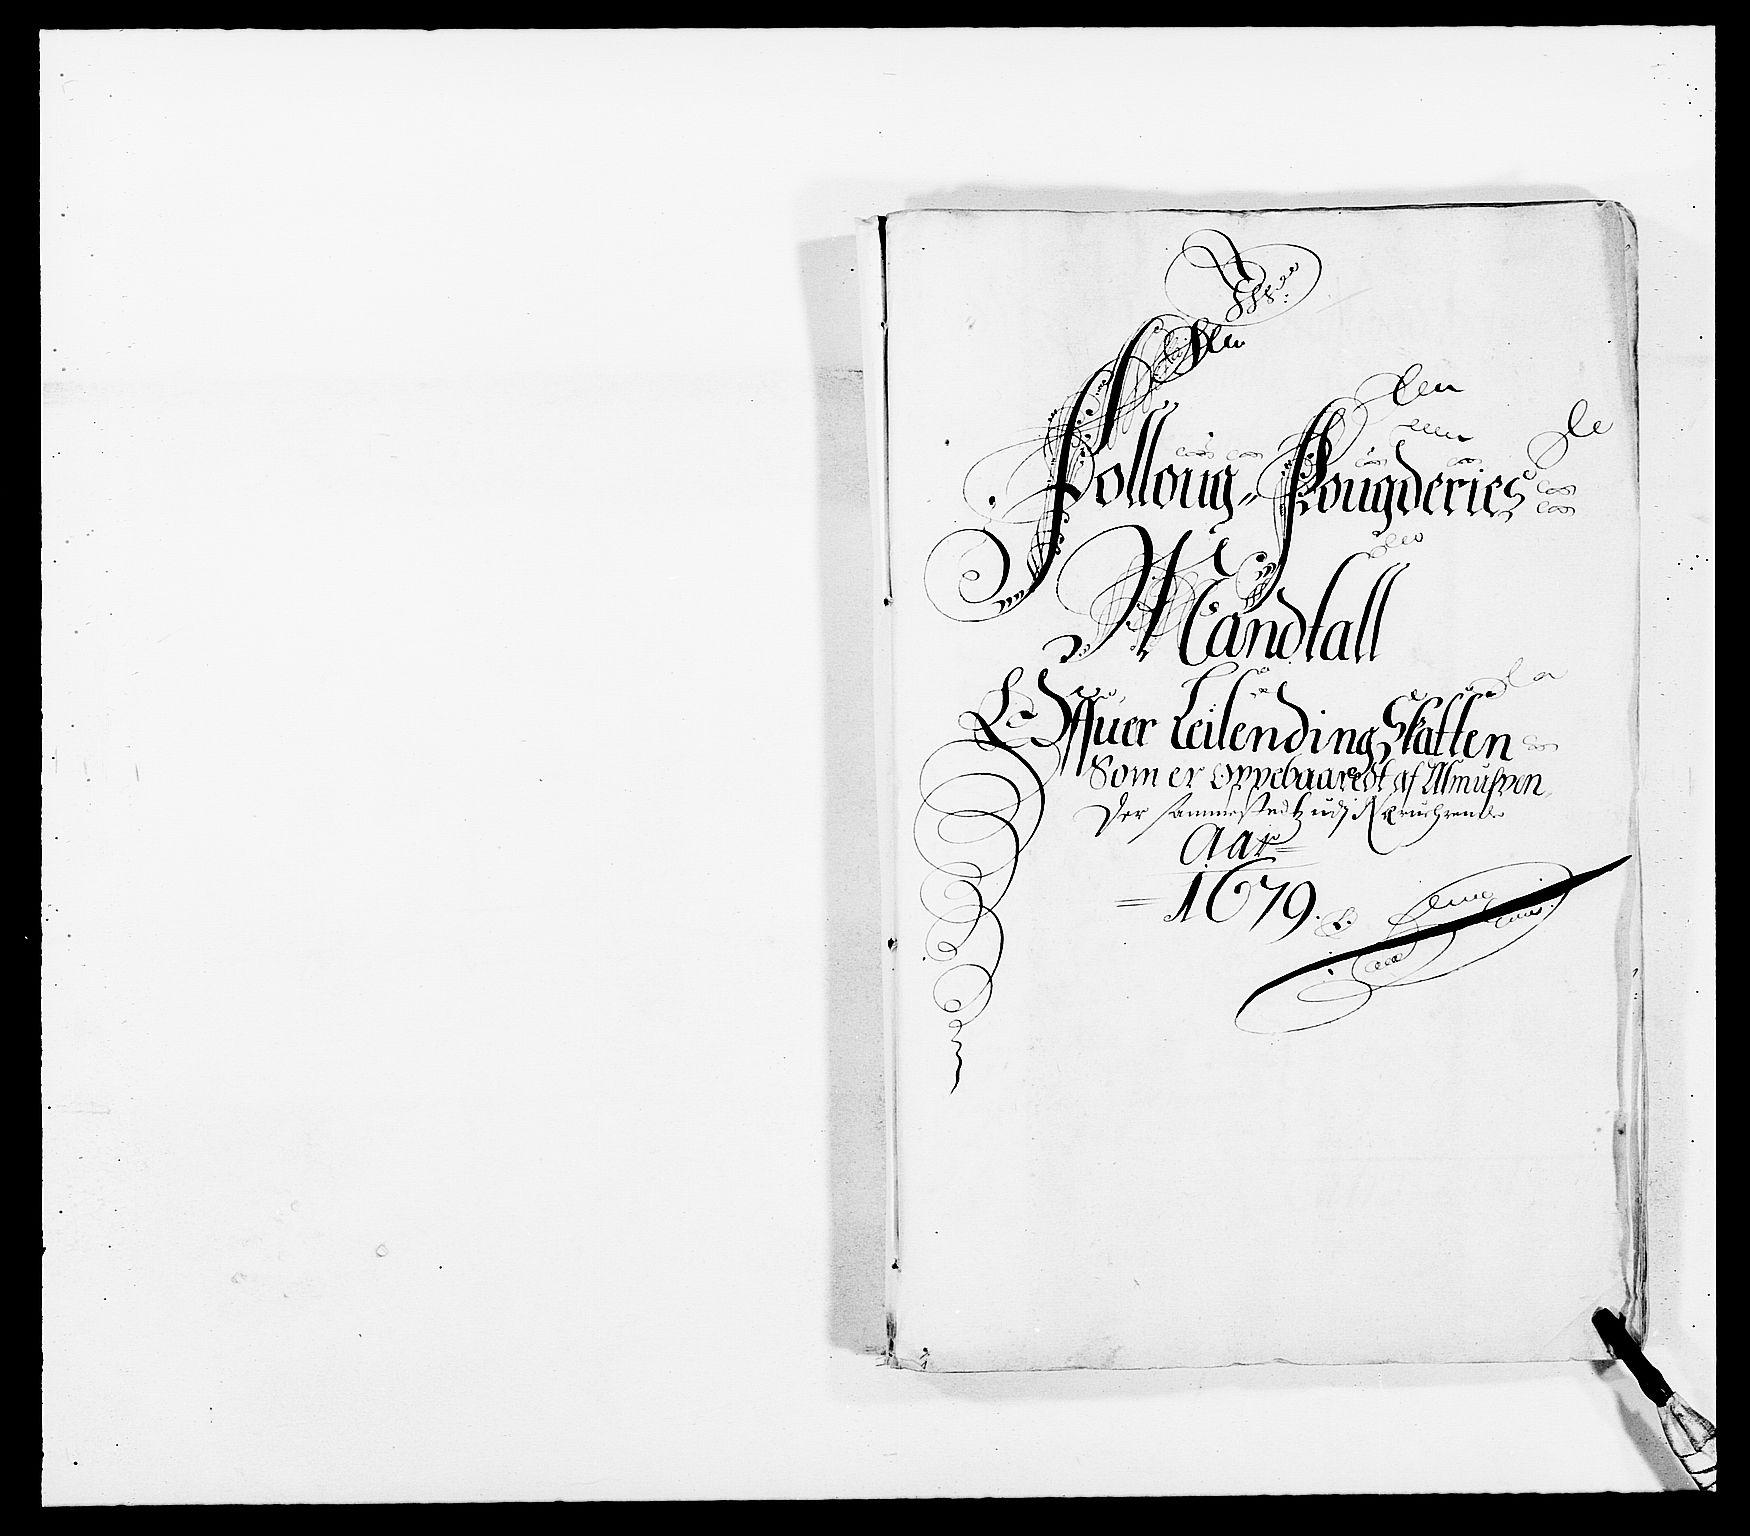 RA, Rentekammeret inntil 1814, Reviderte regnskaper, Fogderegnskap, R09/L0428: Fogderegnskap Follo, 1679, s. 36